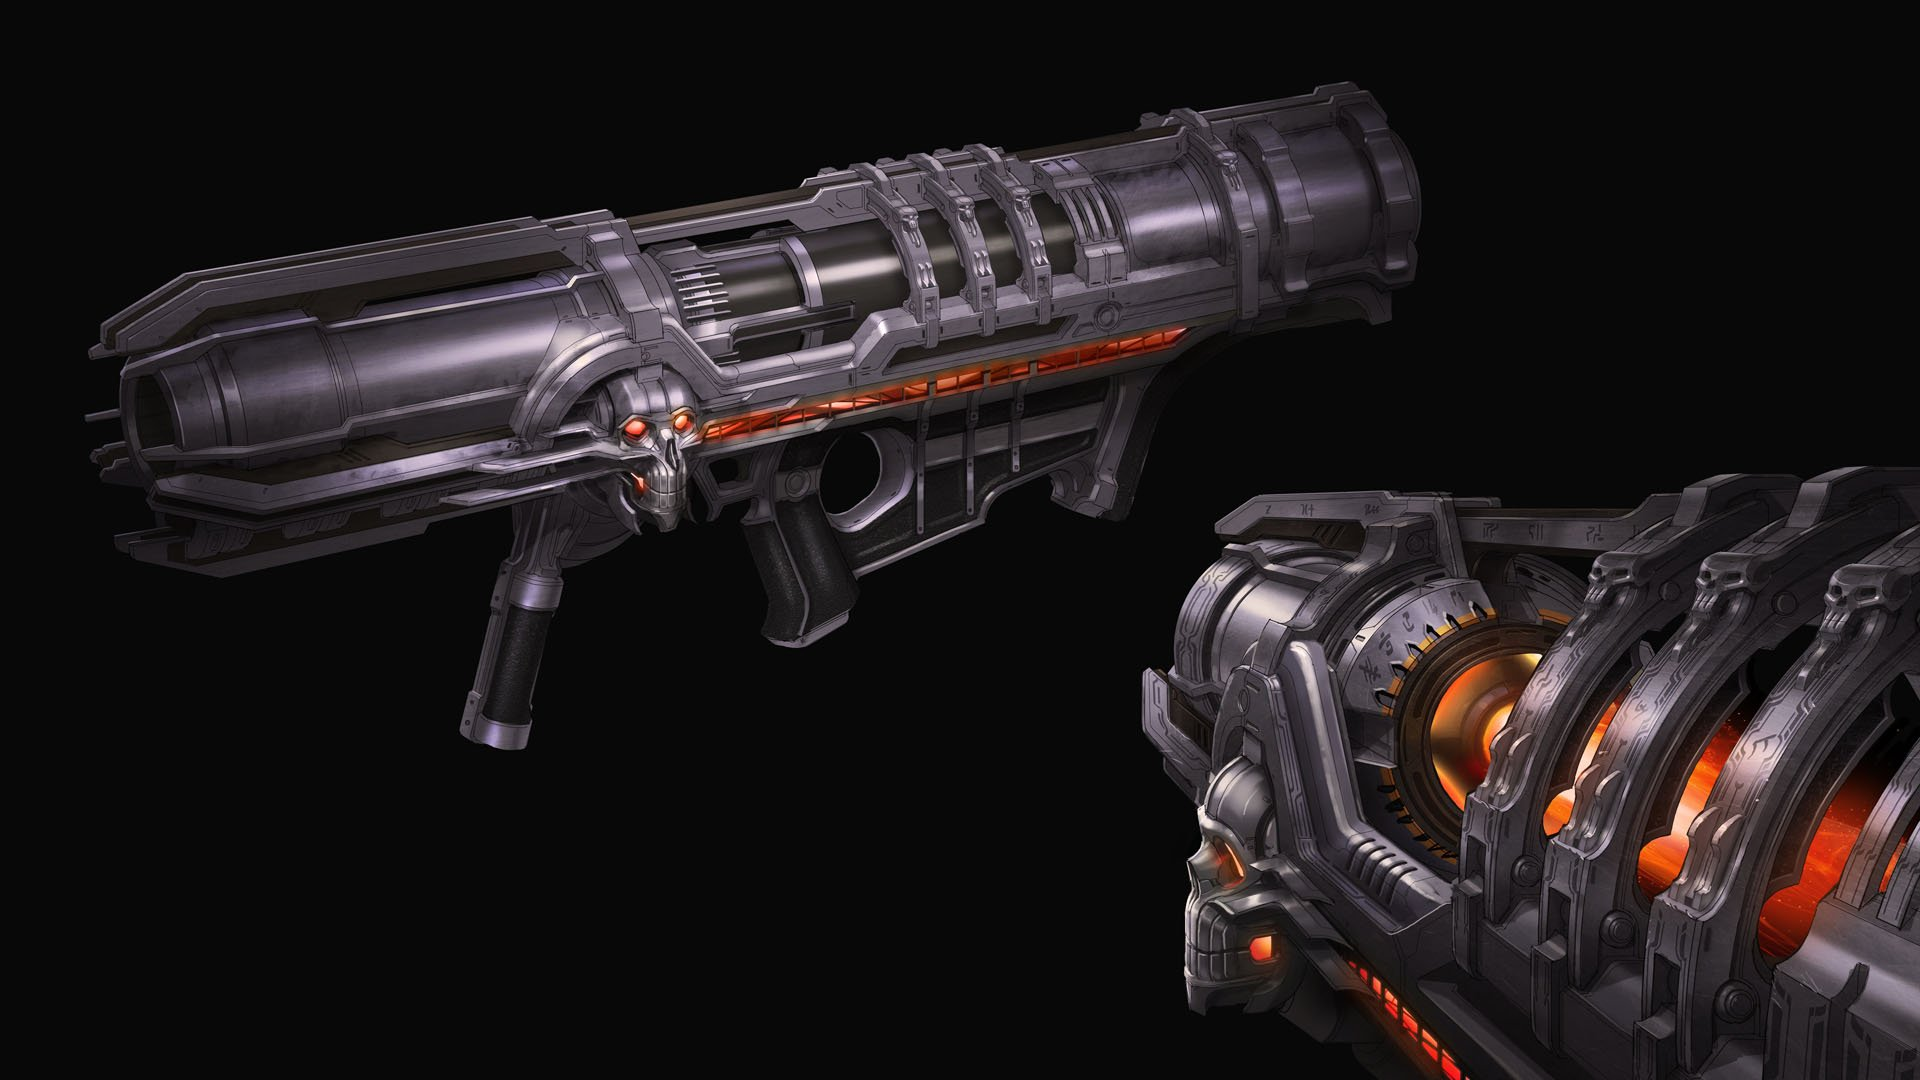 mira-el-primer-gameplay2-y-detalles-de-doom-eternal-frikgiamers.com